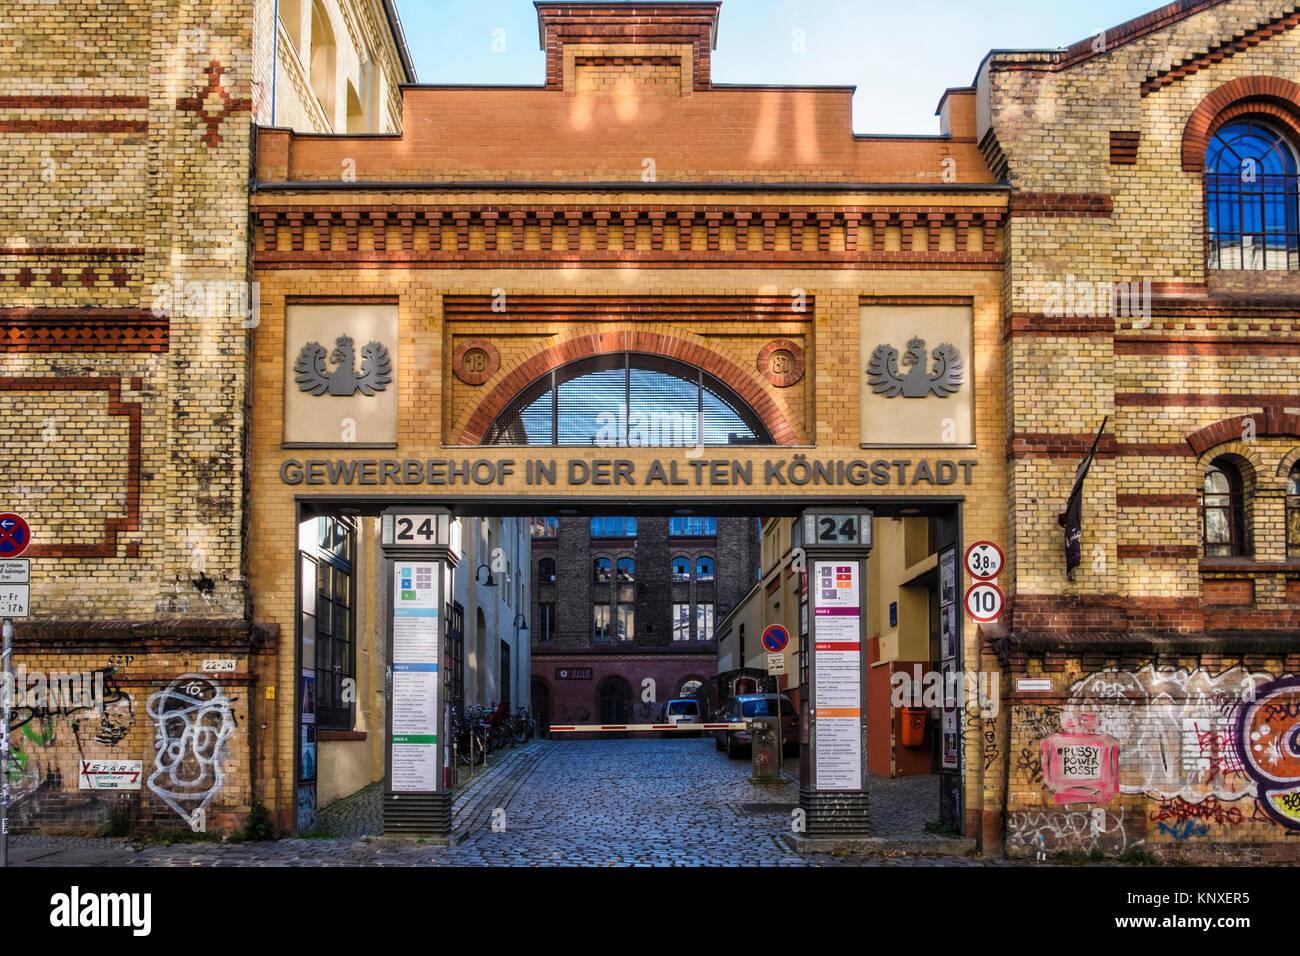 Berlin,Prenzlauerberg, Former Königstadt brewery. Resident companies form co-operative & buy building in - Stock Image